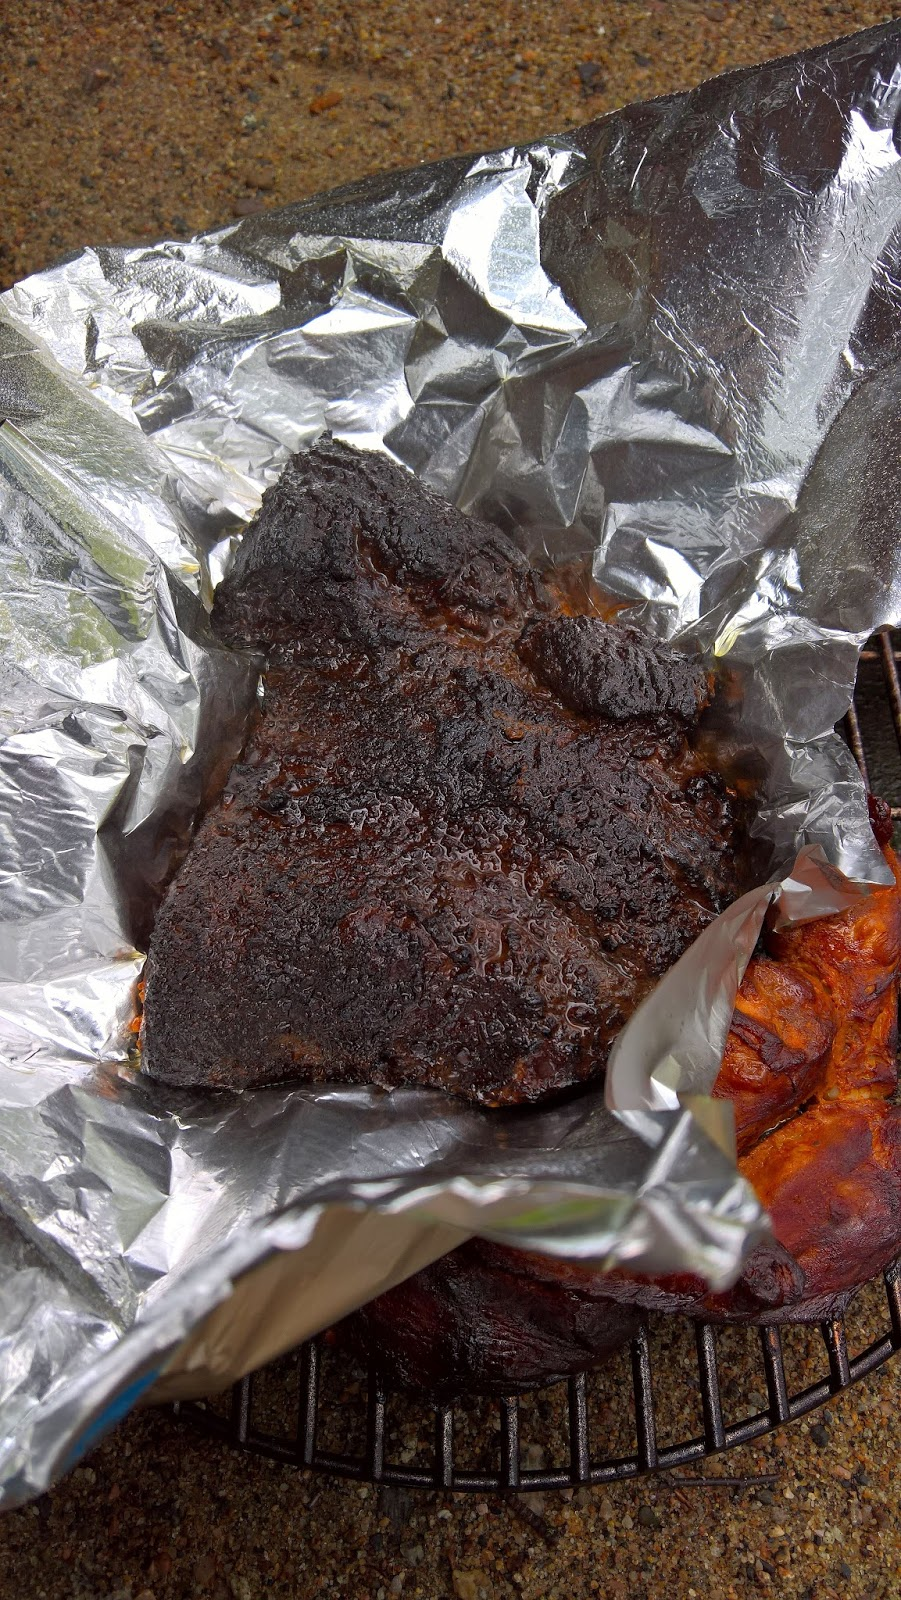 savustettu brisket naudanrinta savustus pikakimchi sushiriisi weber smokey mountain